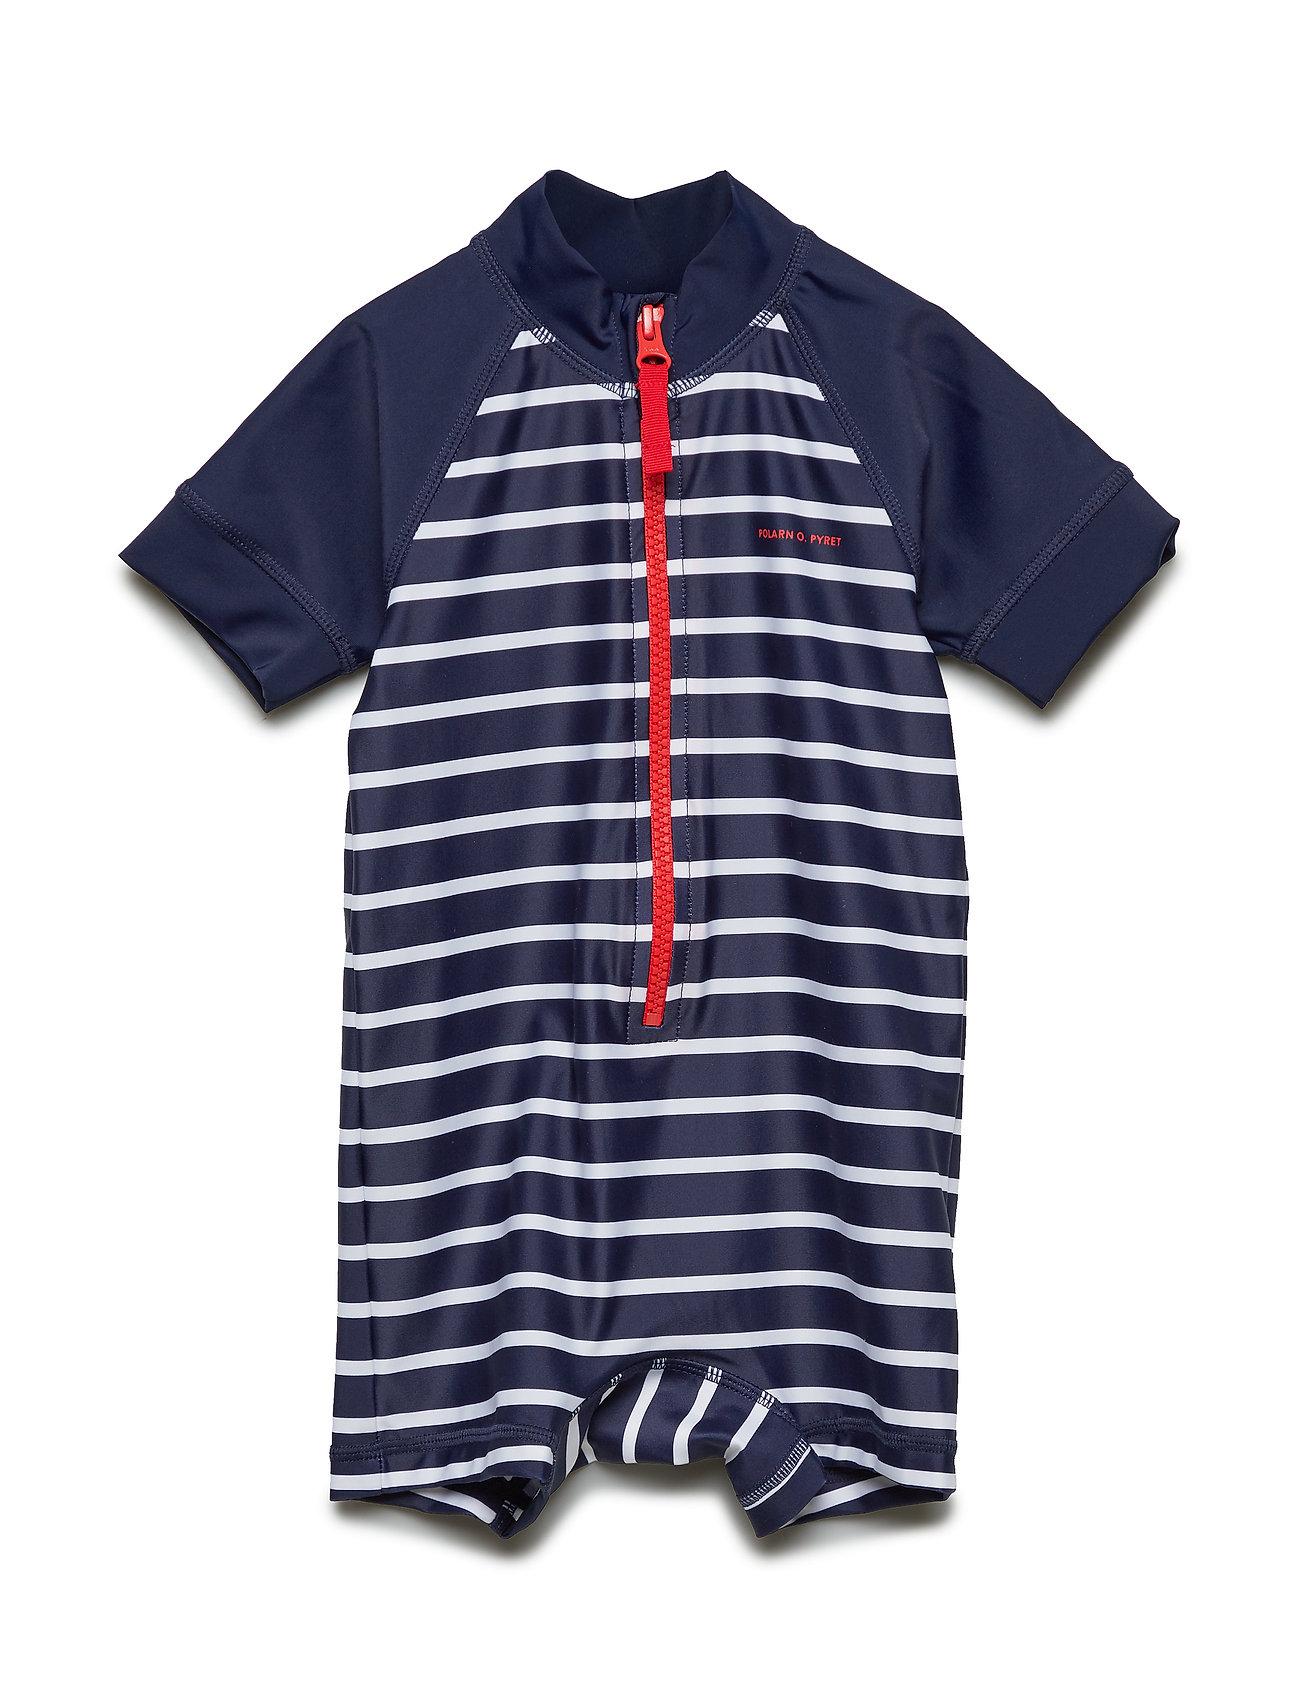 Polarn O. Pyret Swimsuit Short UPF